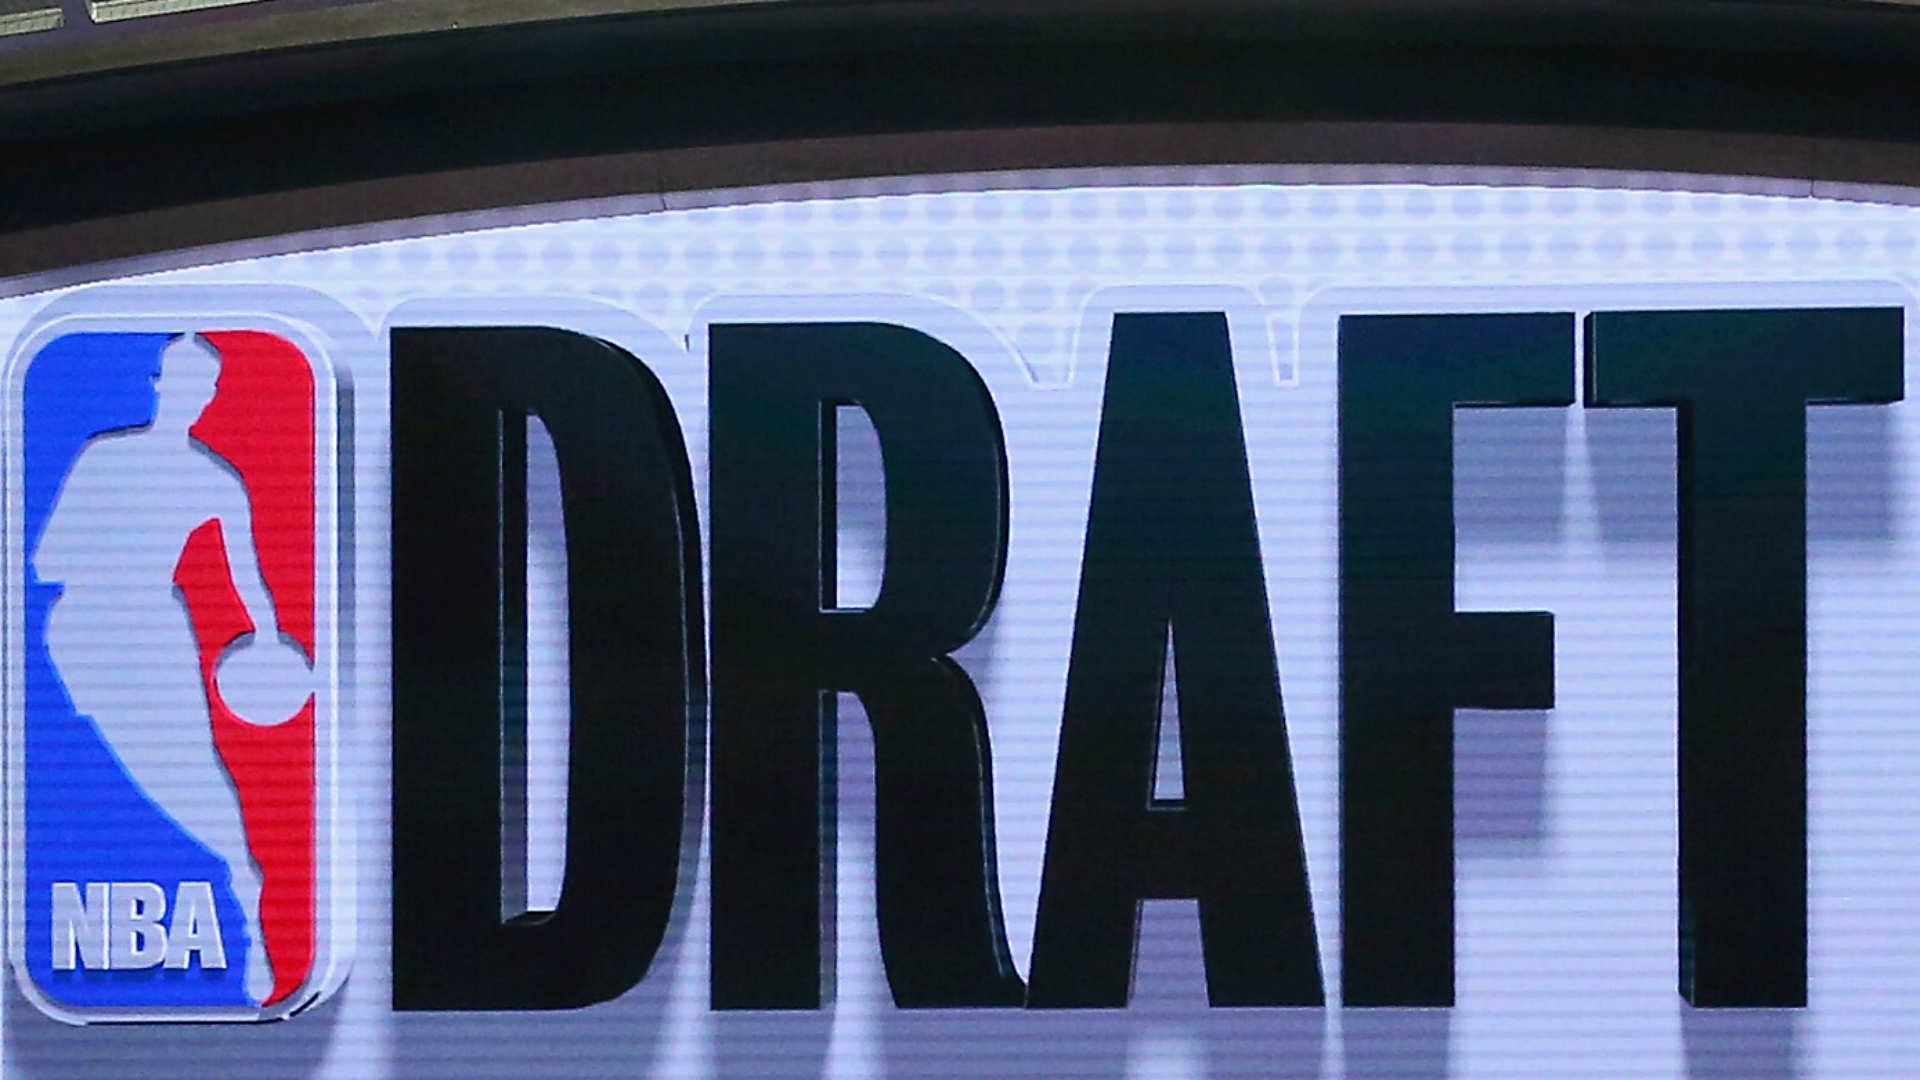 Nba Draft: Central Michigan's Marcus Keene, Nation's Leading Scorer